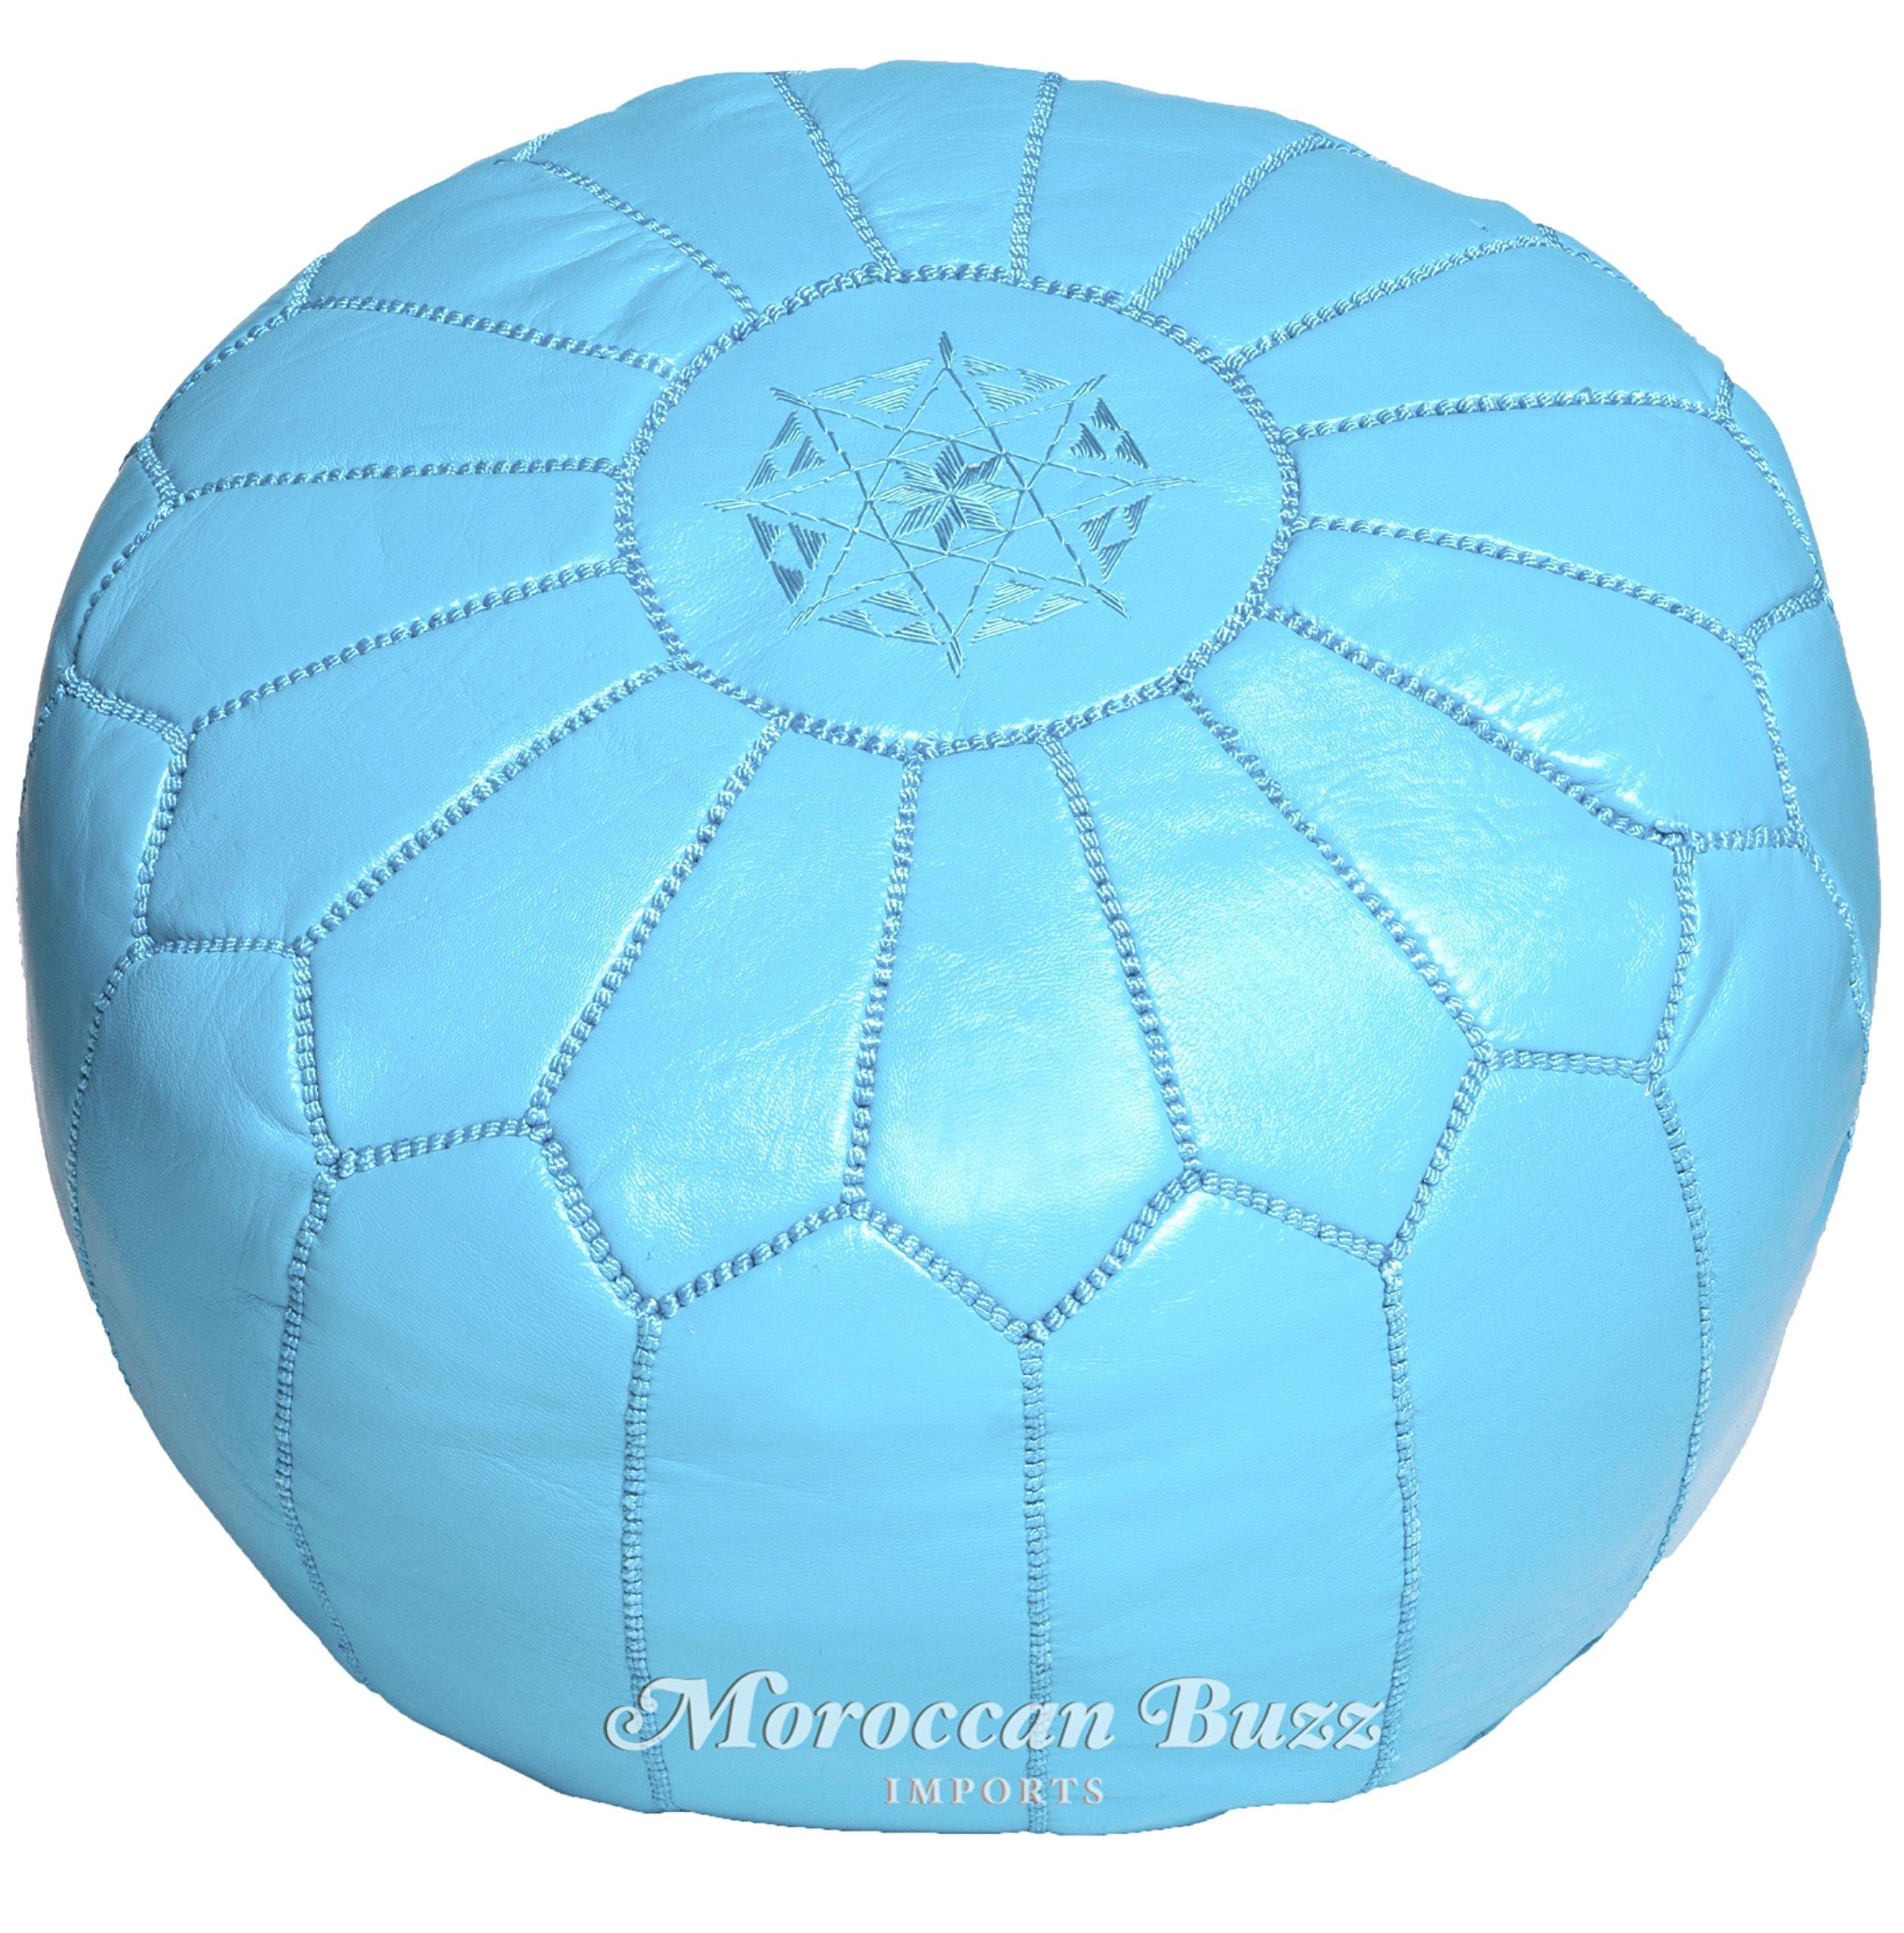 Moroccan Buzz 18-Pound Premium Stuffed Leather Pouf Ottoman, Sky Blue